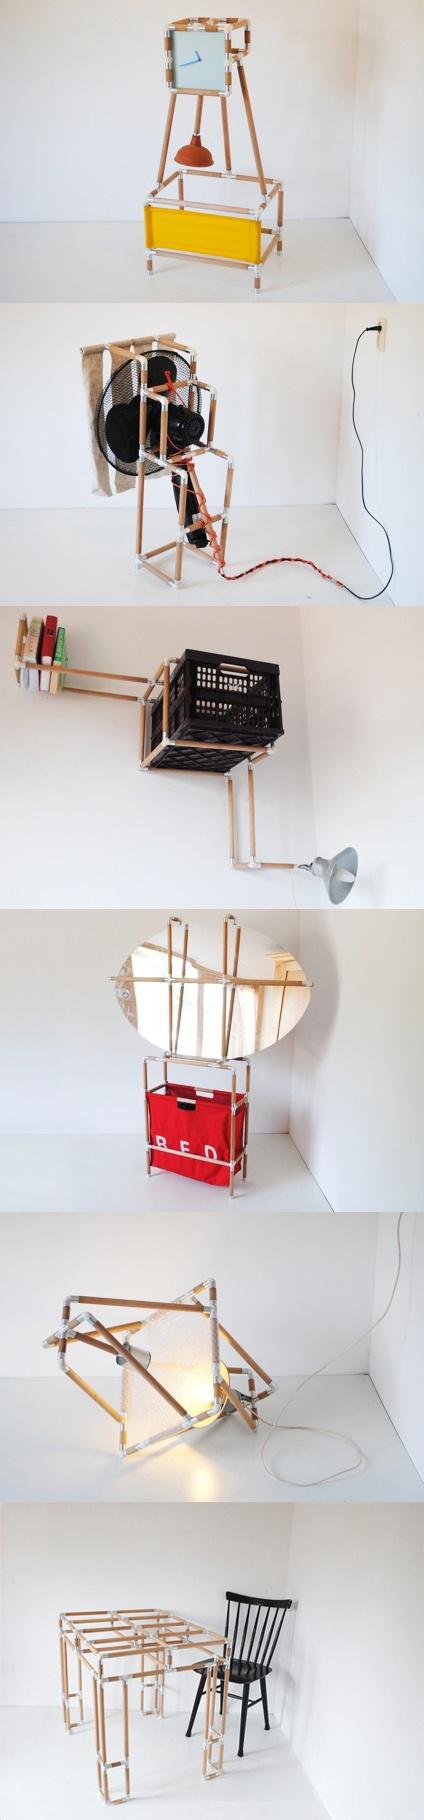 Sistema+para+crear+muebles+muy+ingenioso